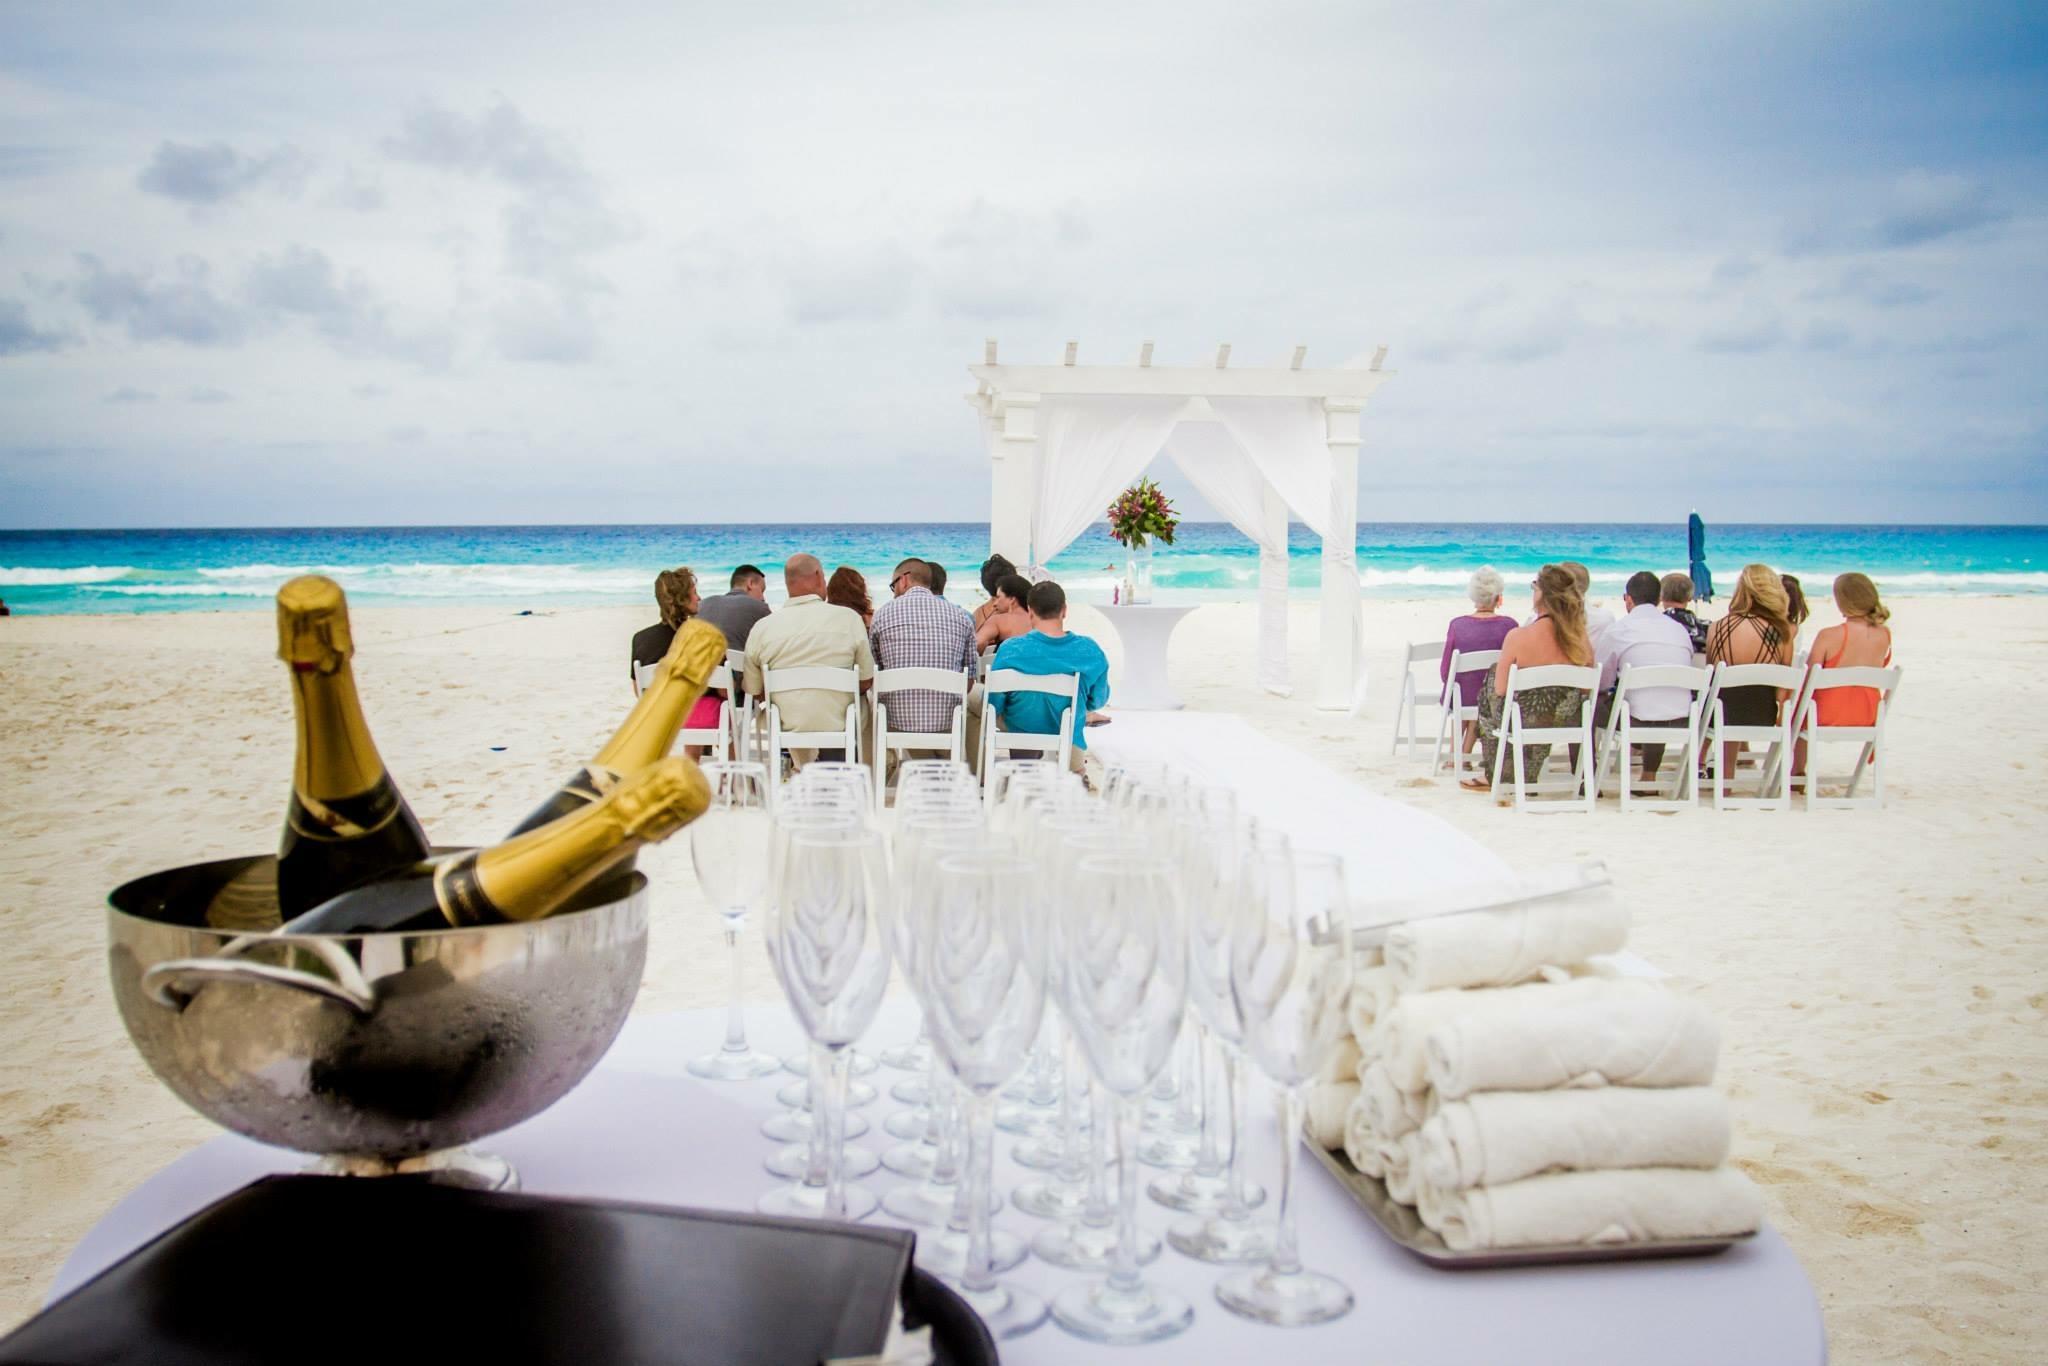 krysten-reed-cancun-beach-wedding-9.JPG